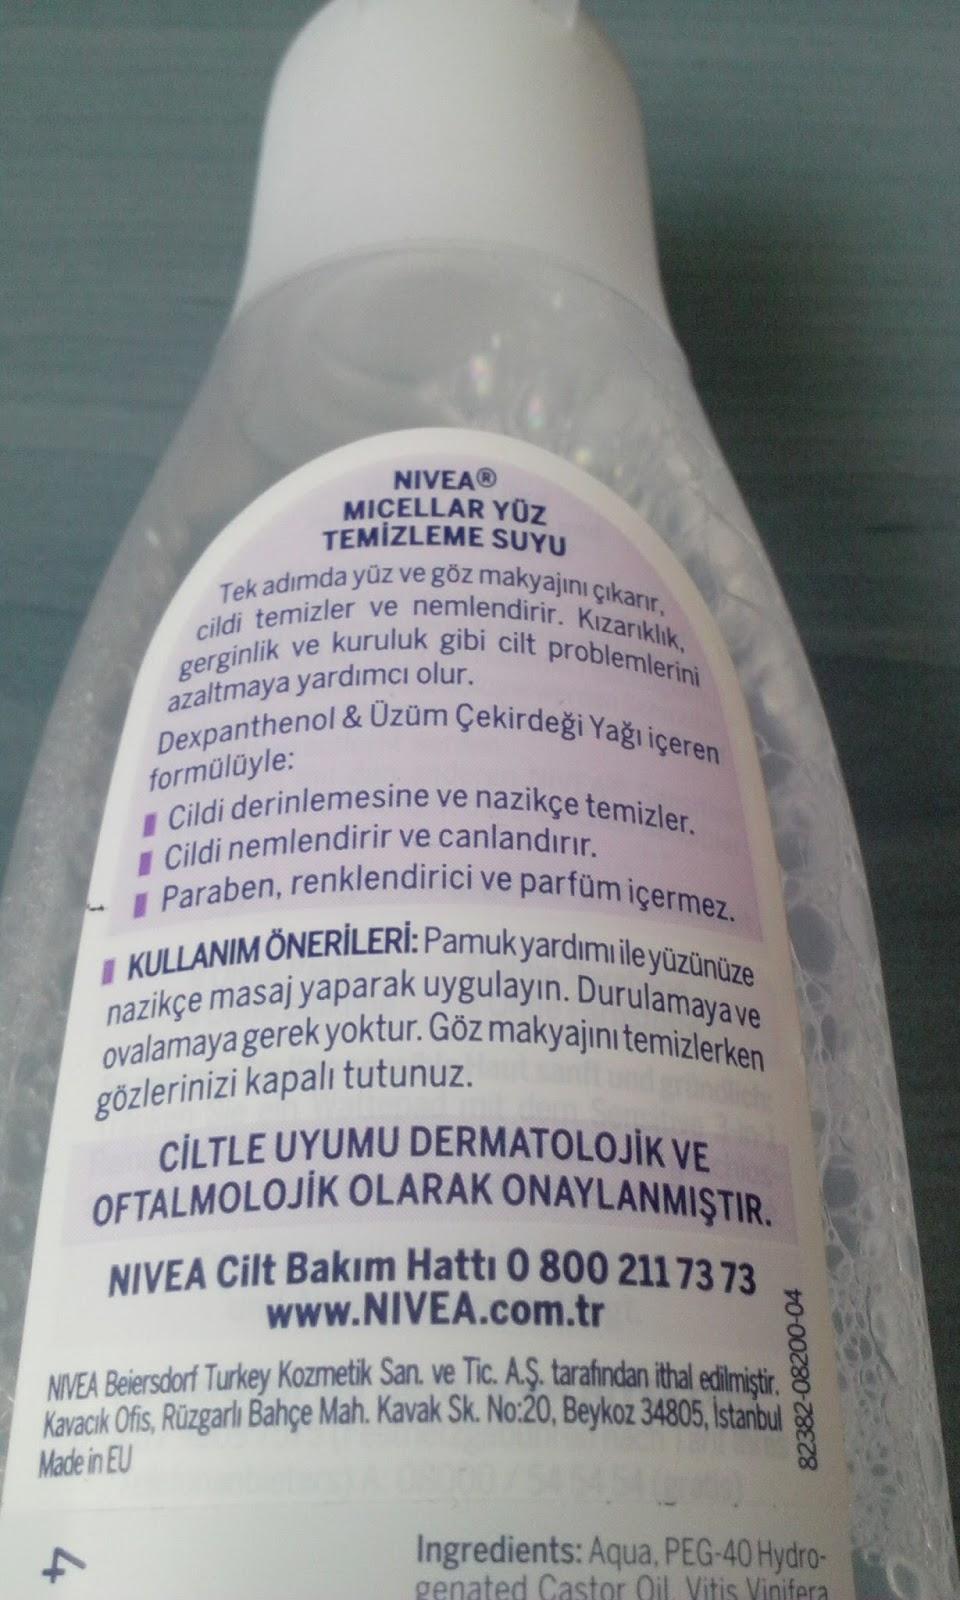 nivea micellar makyaj temizleme suyu